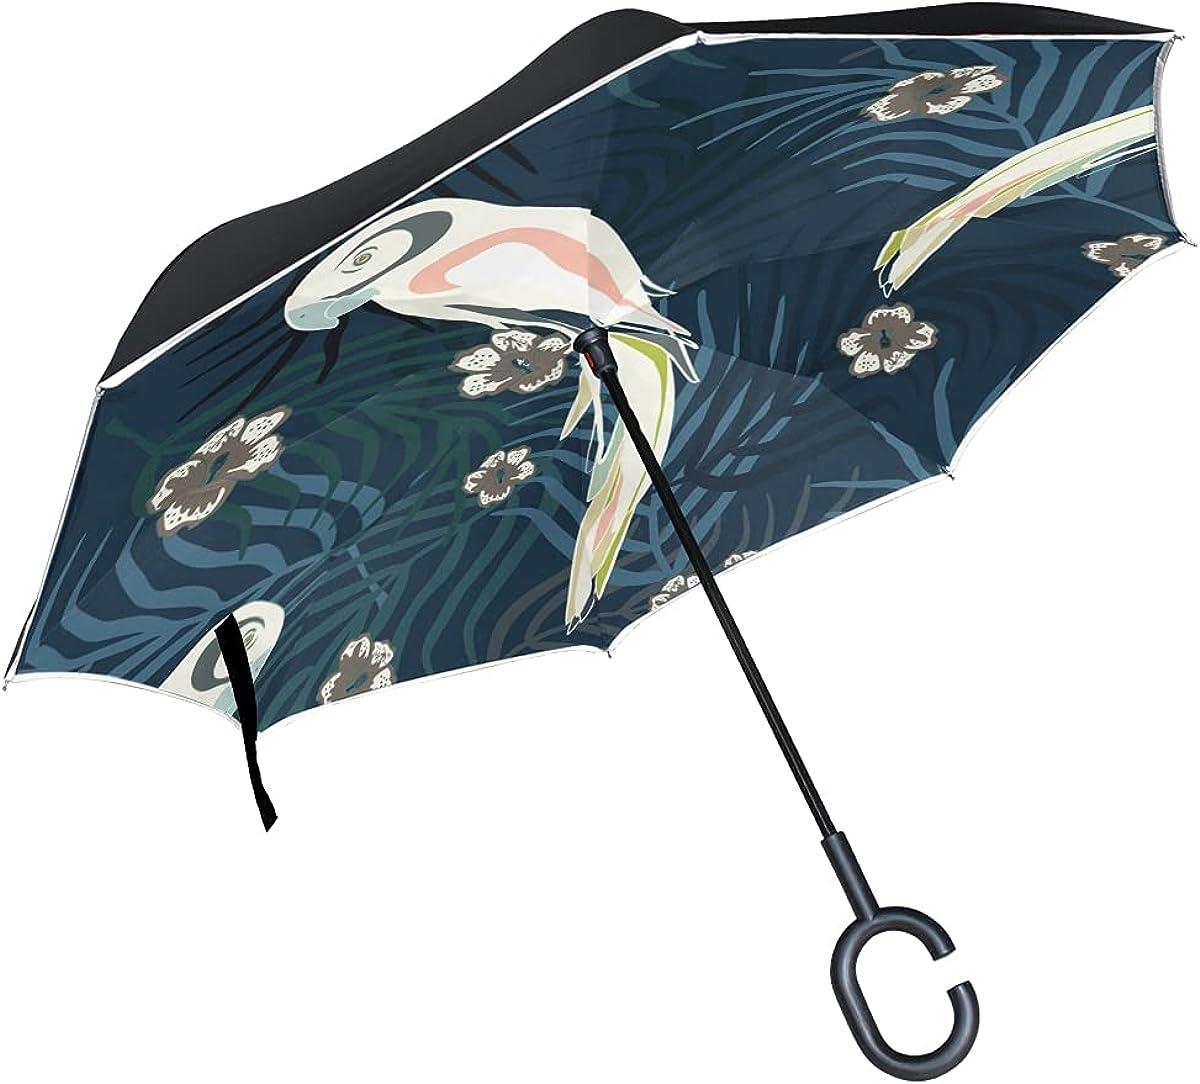 Inverted Umbrella Exotic Parrots White Tropical Night Umb Jungle Soldering Direct sale of manufacturer